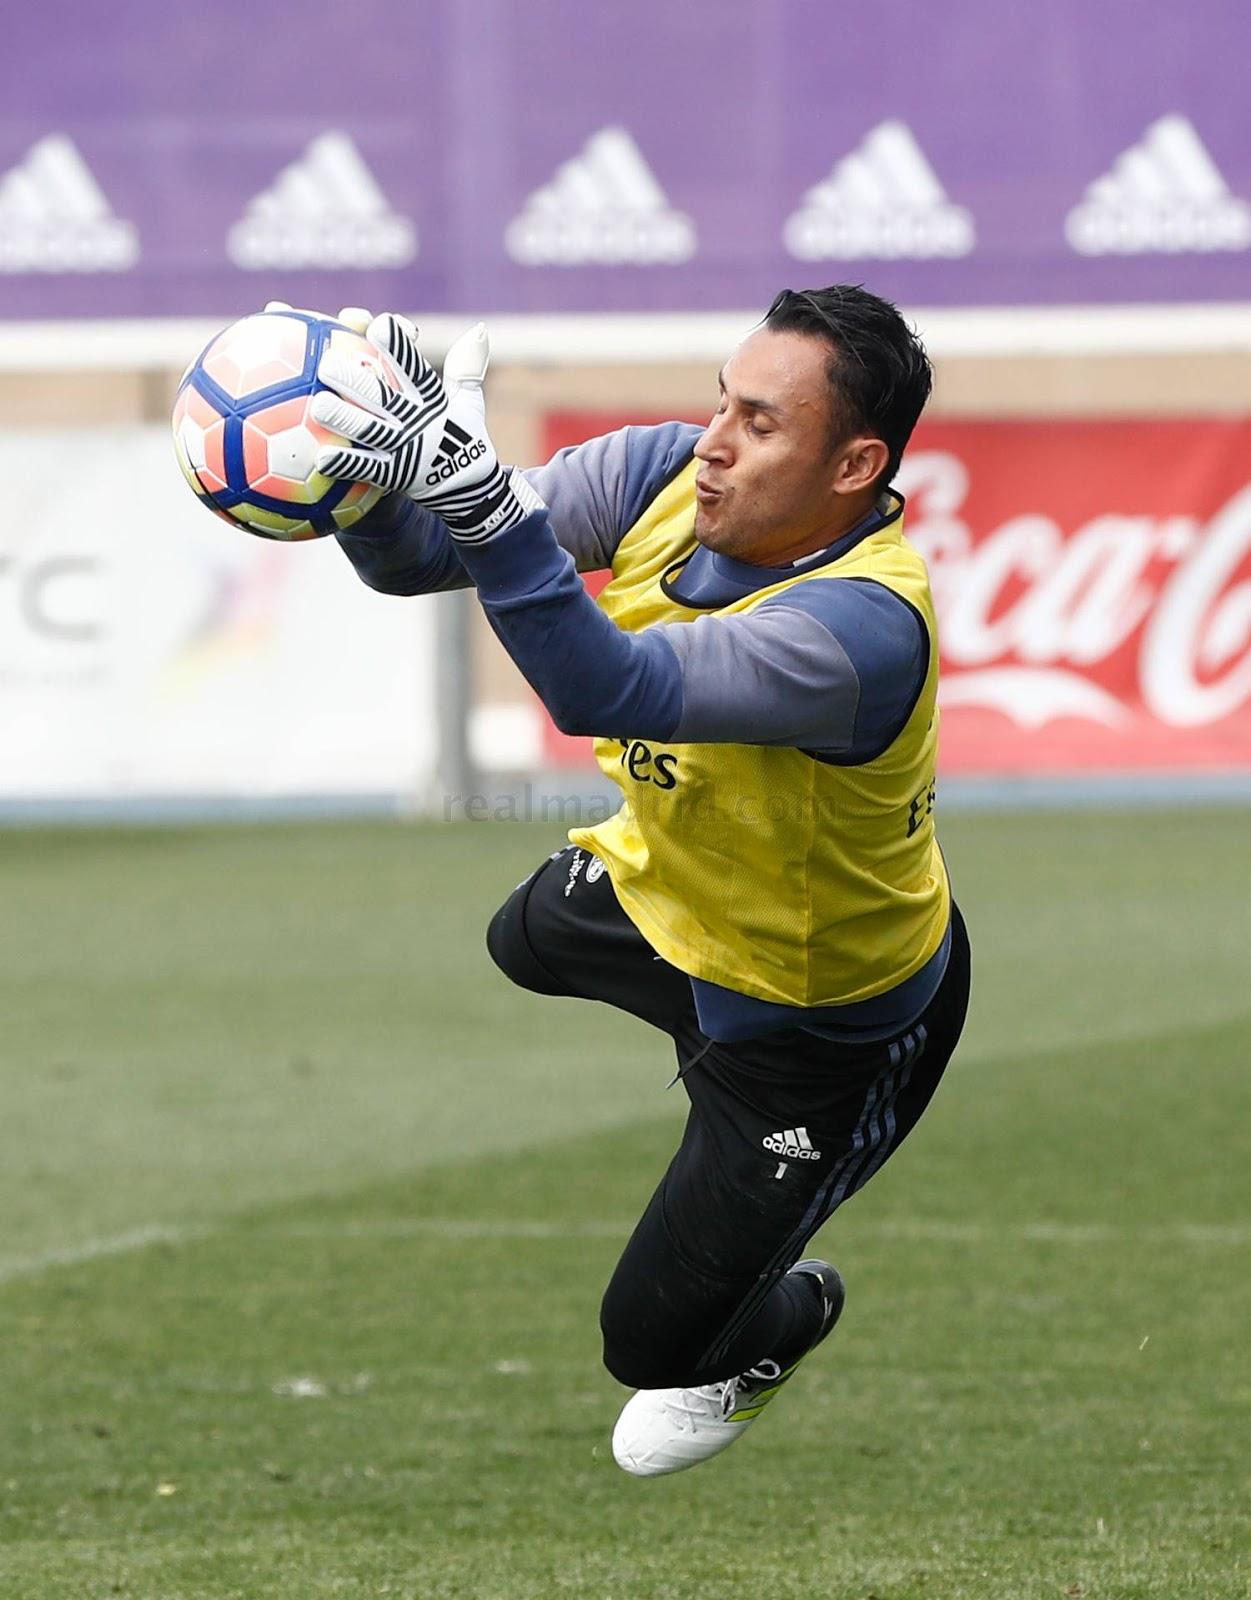 Keylor Navas Reveals Next Gen Adidas Goalkeeper Gloves and